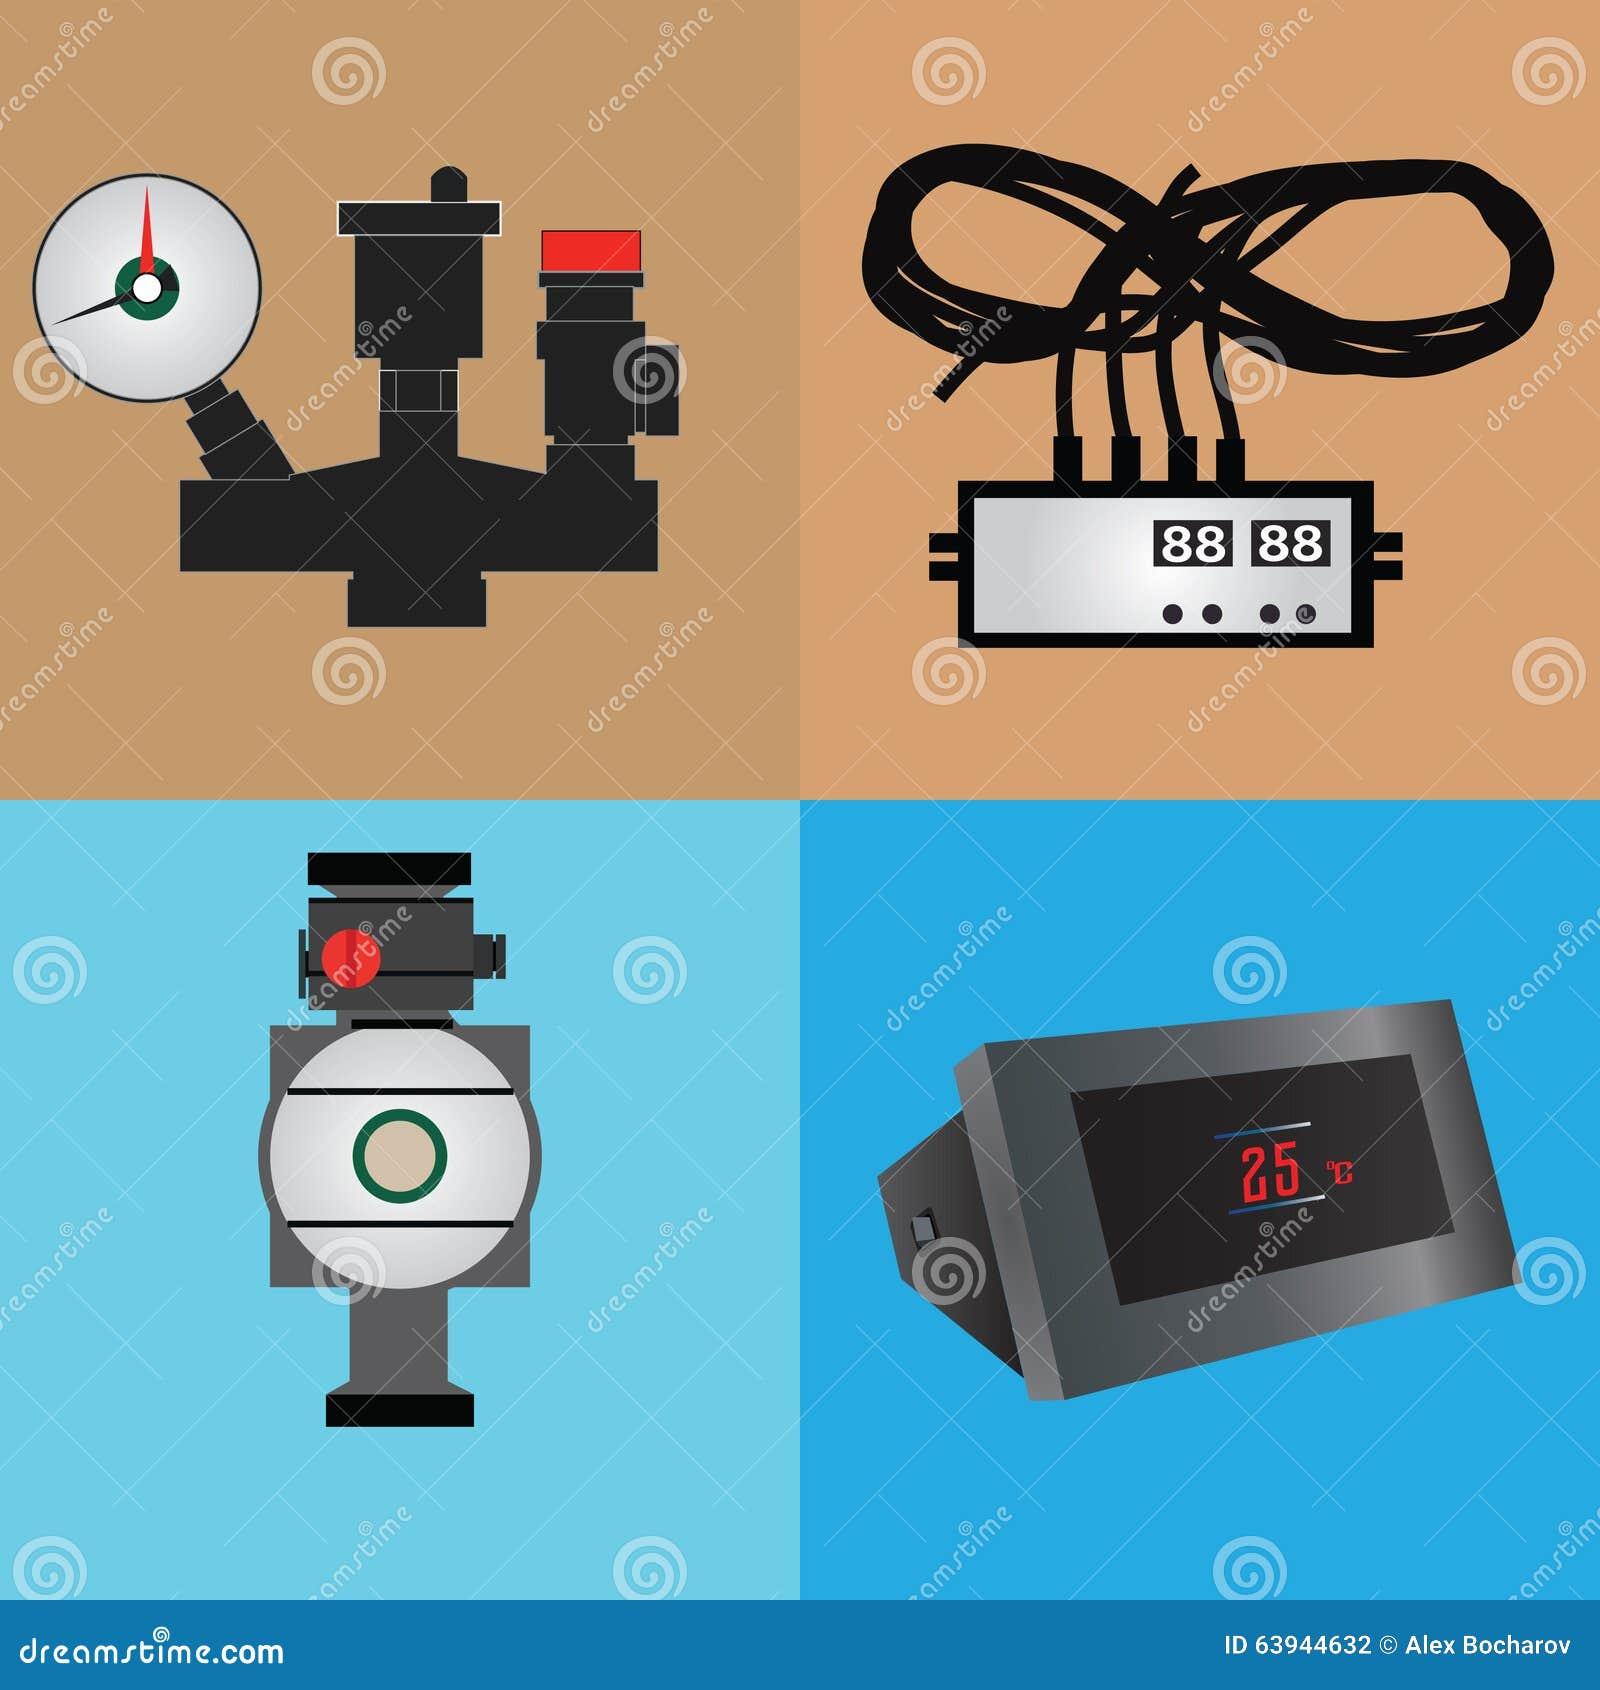 Set for heating stock vector. Illustration of house, equipment ...